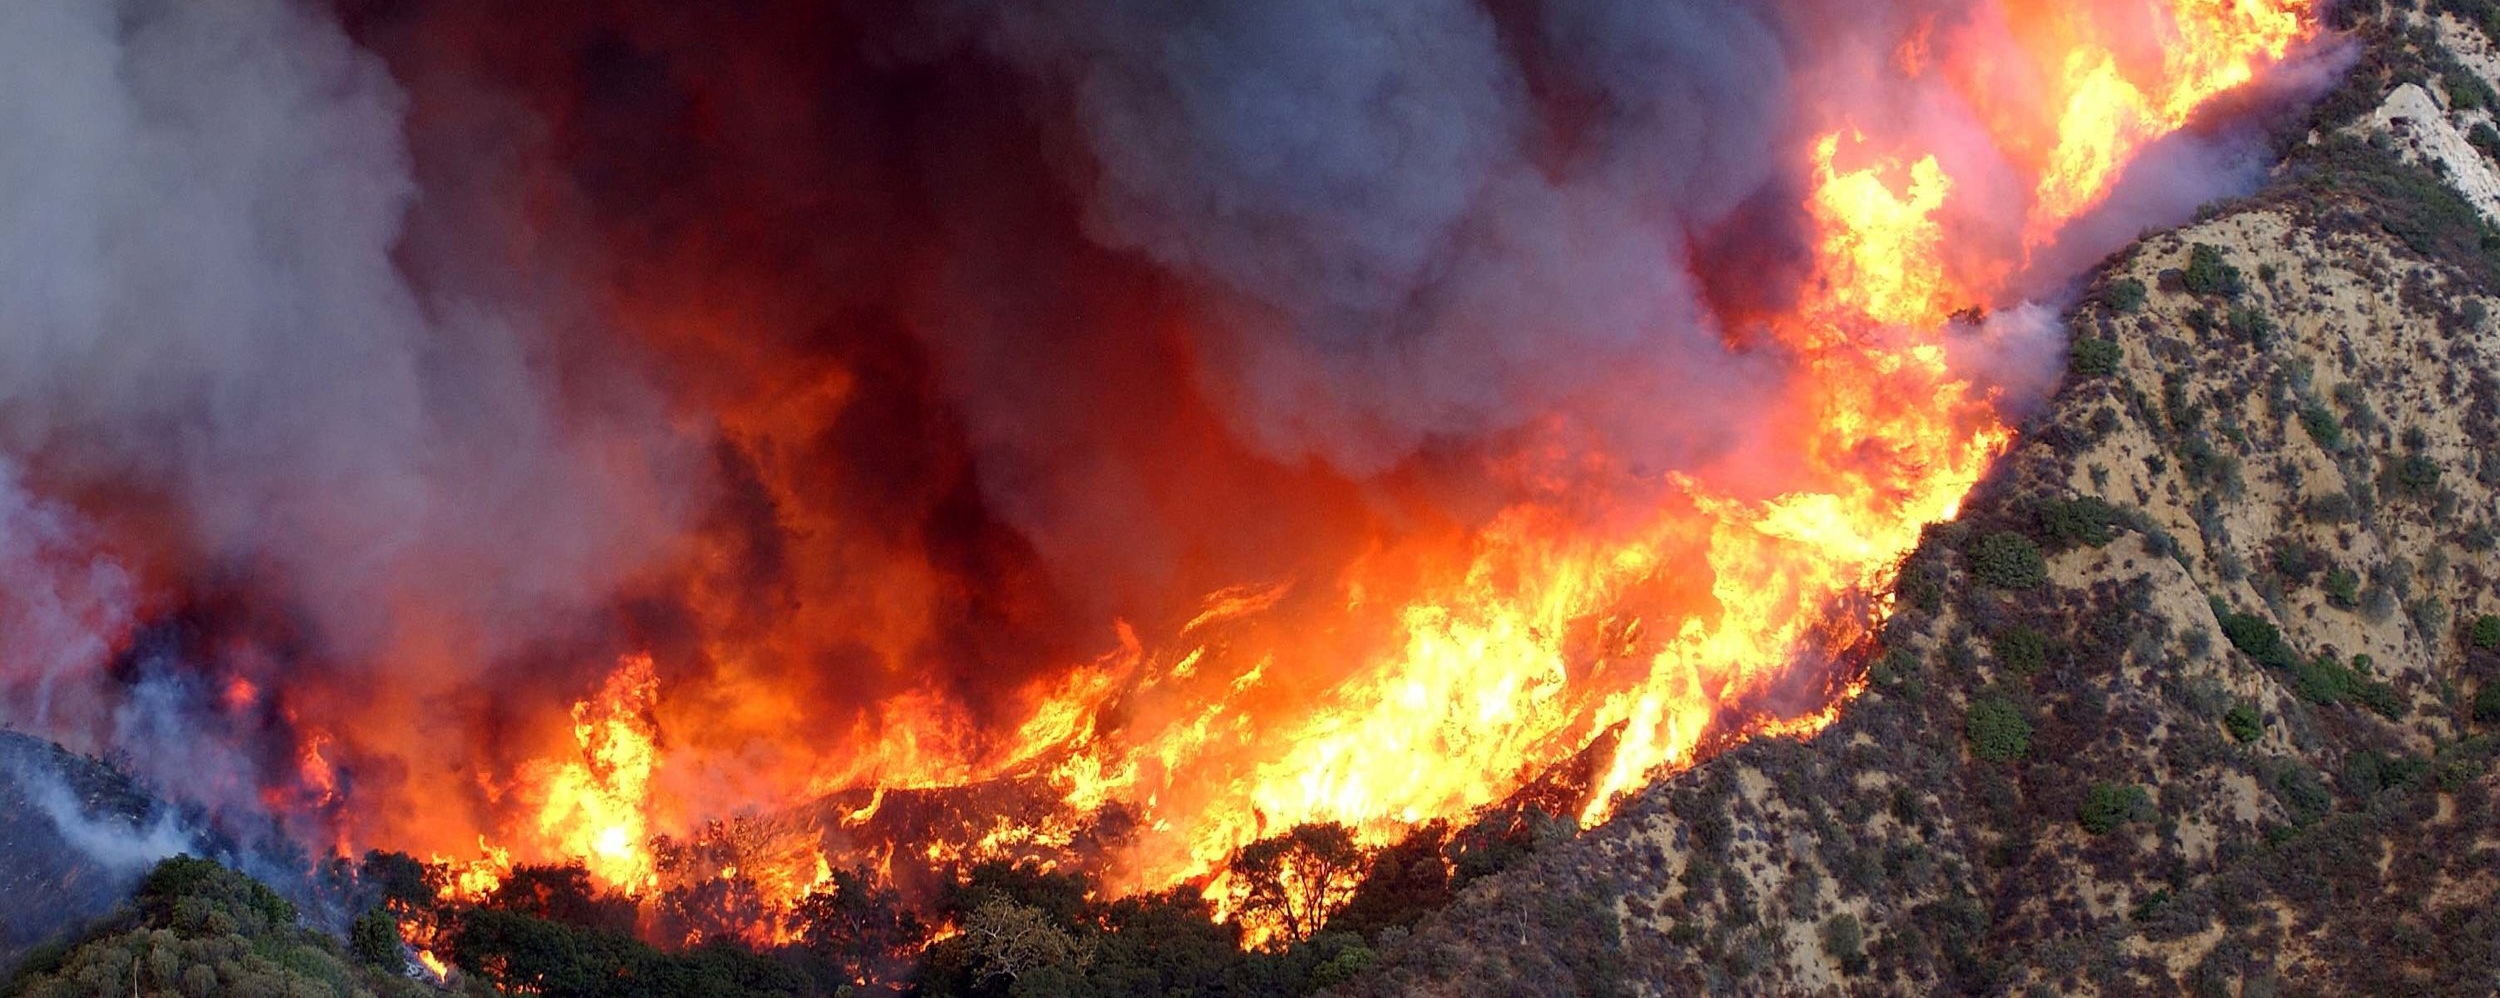 wildfire 2018 web.jpg